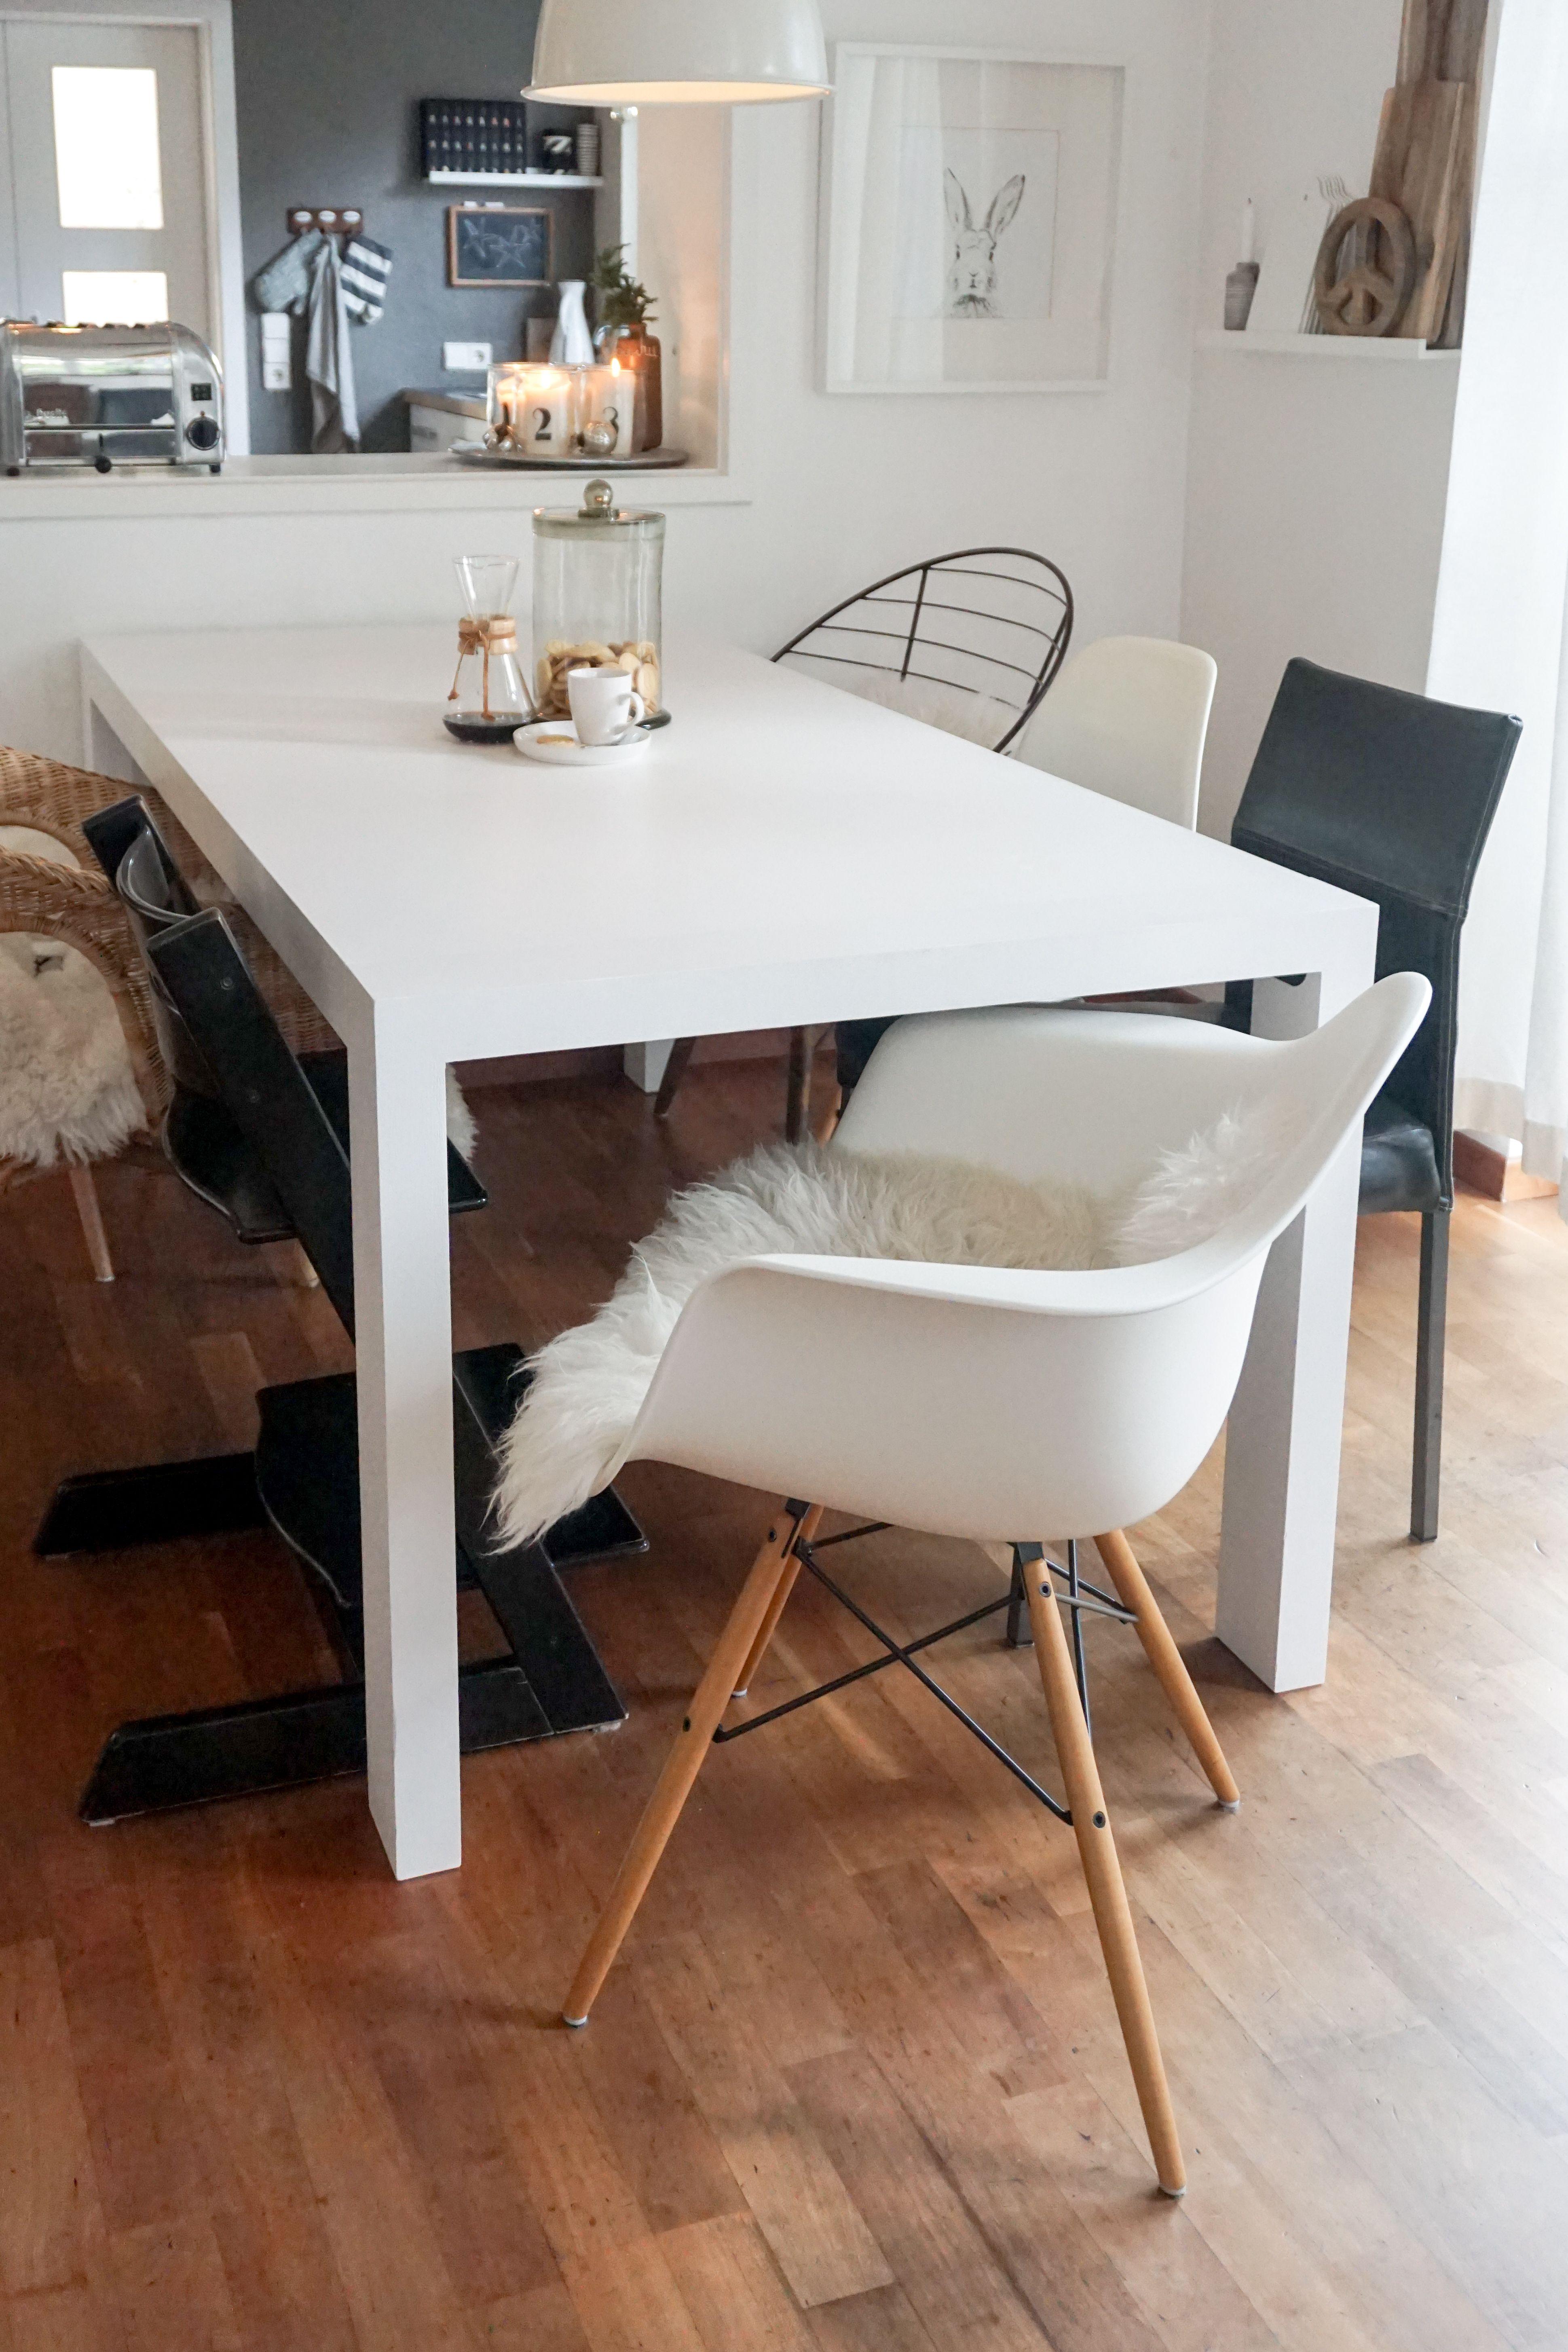 Vitra Eames Plastic Armchair DAW Ahorn Gelblich Weiß